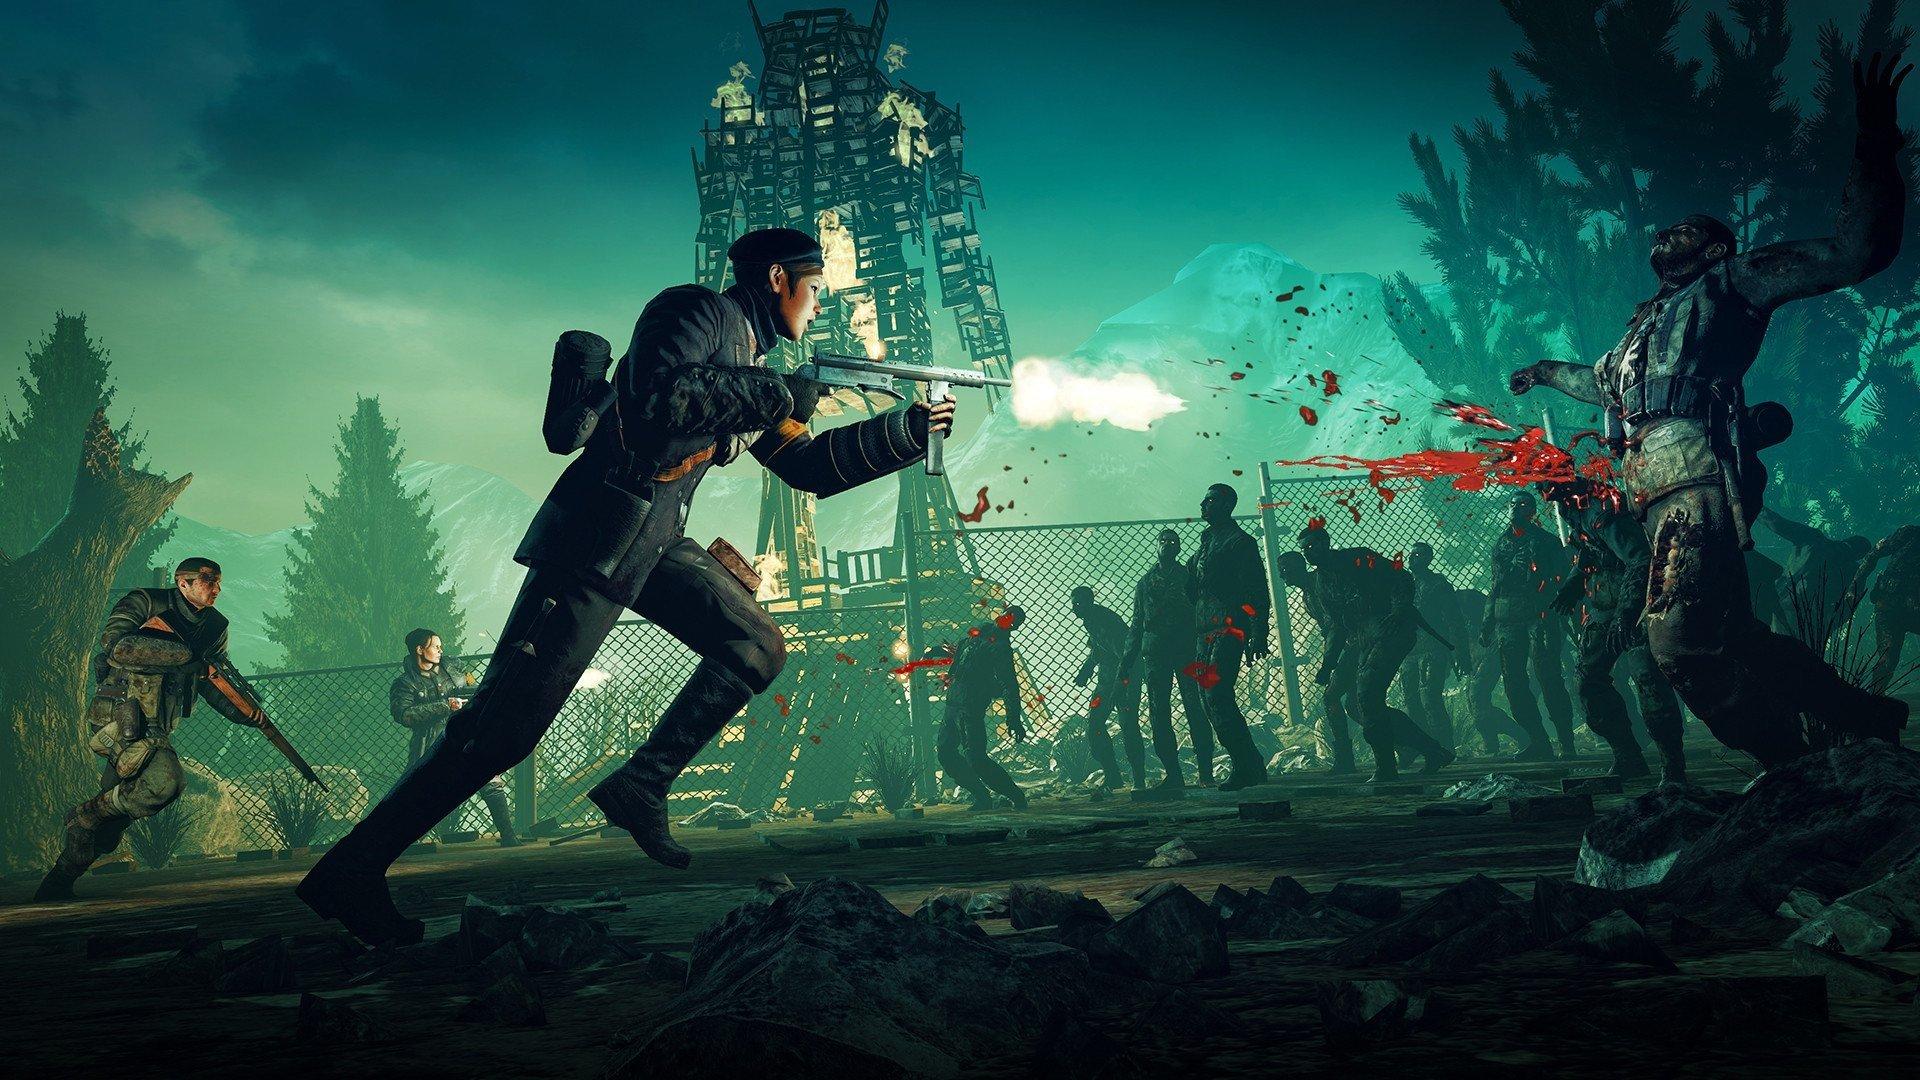 Sniper Elite Nazi Zombie Army HD Wallpaper 3   1920 X 1080 1920x1080